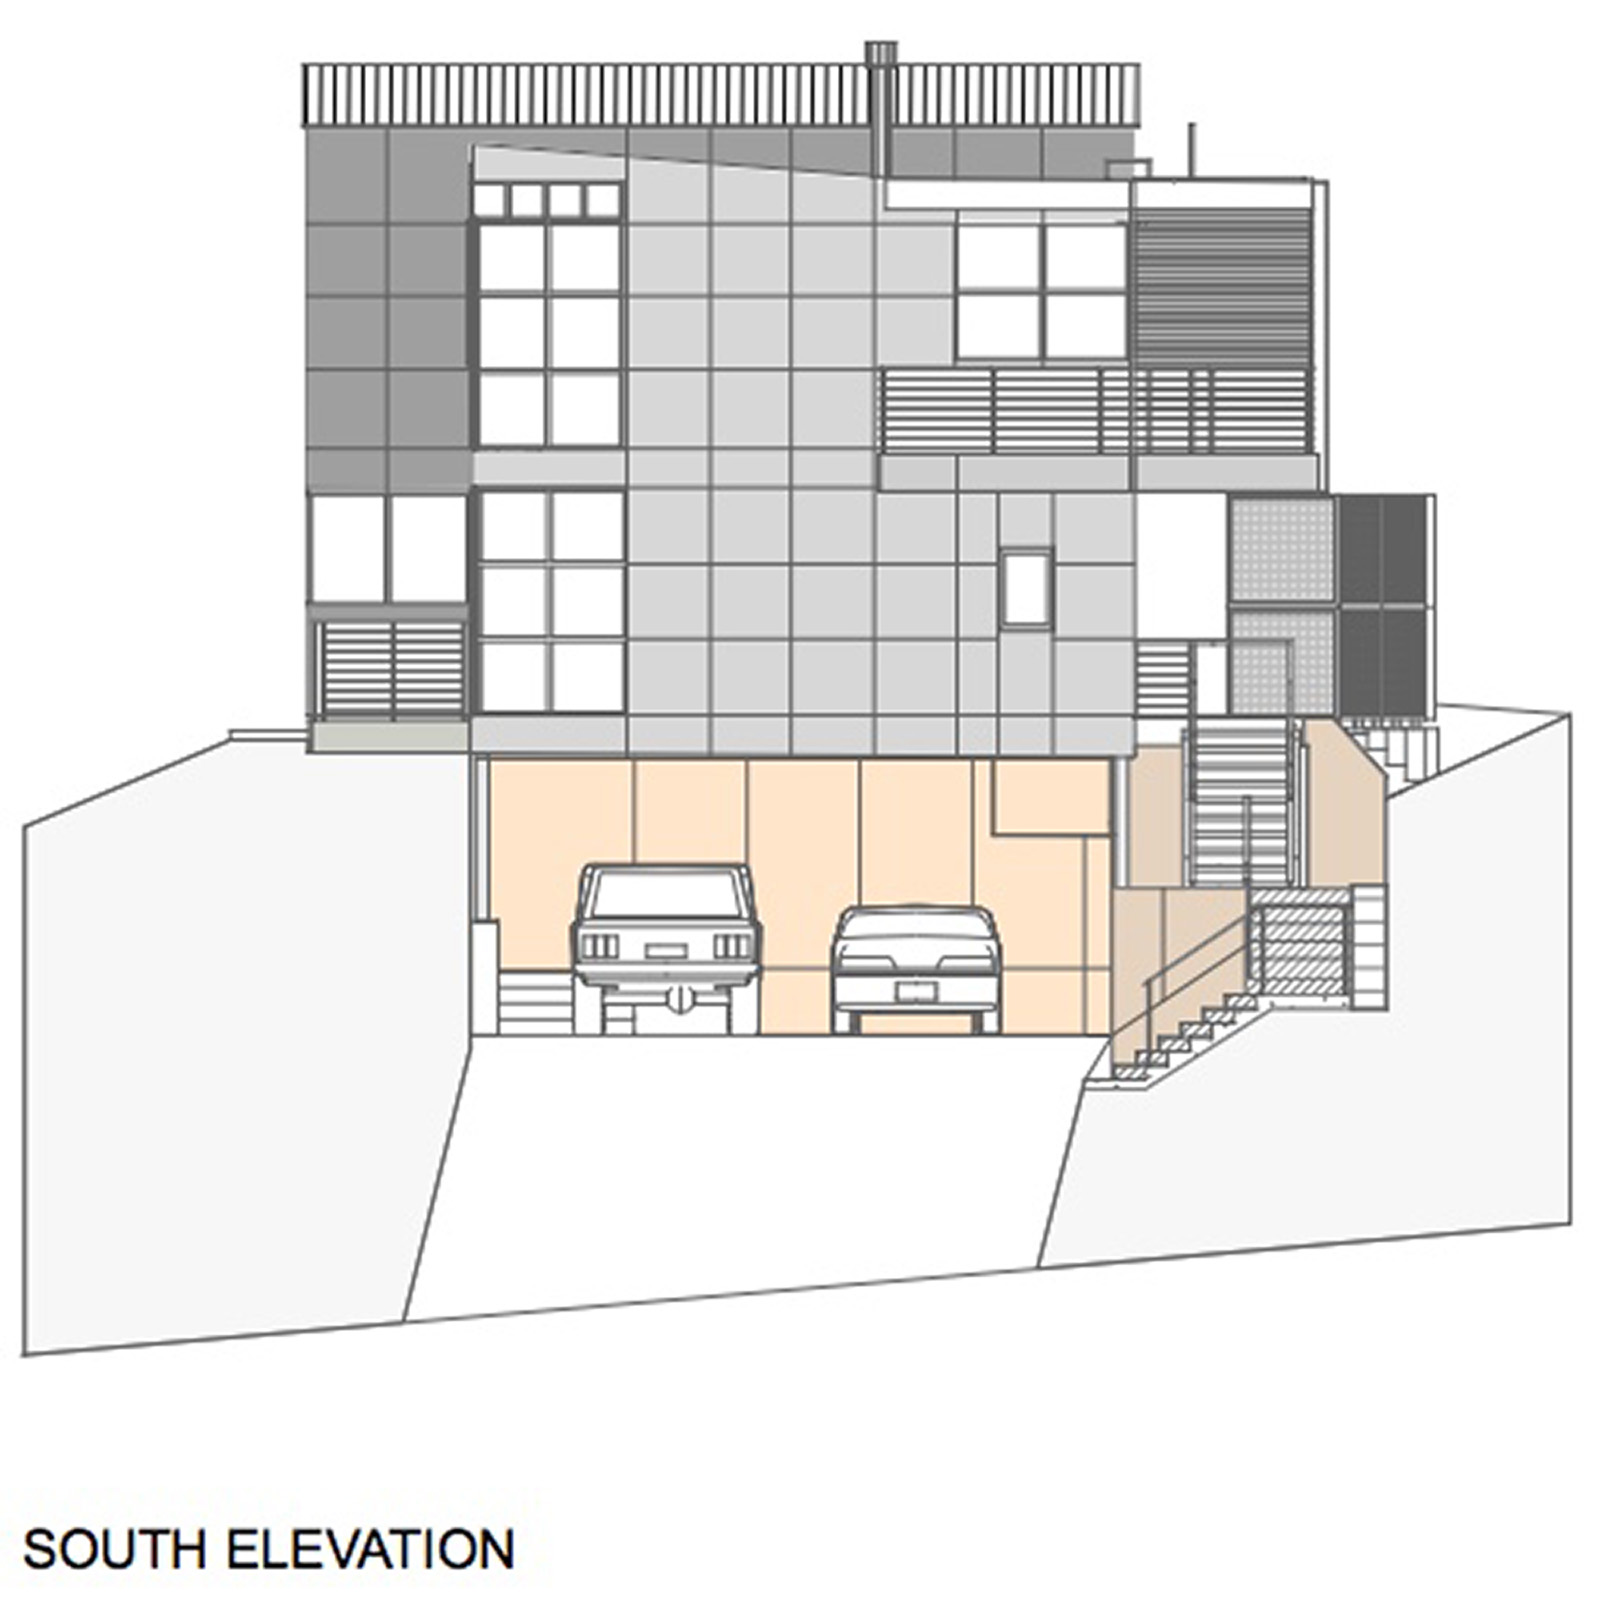 South Elevation Nichols Design Associates, Inc.}